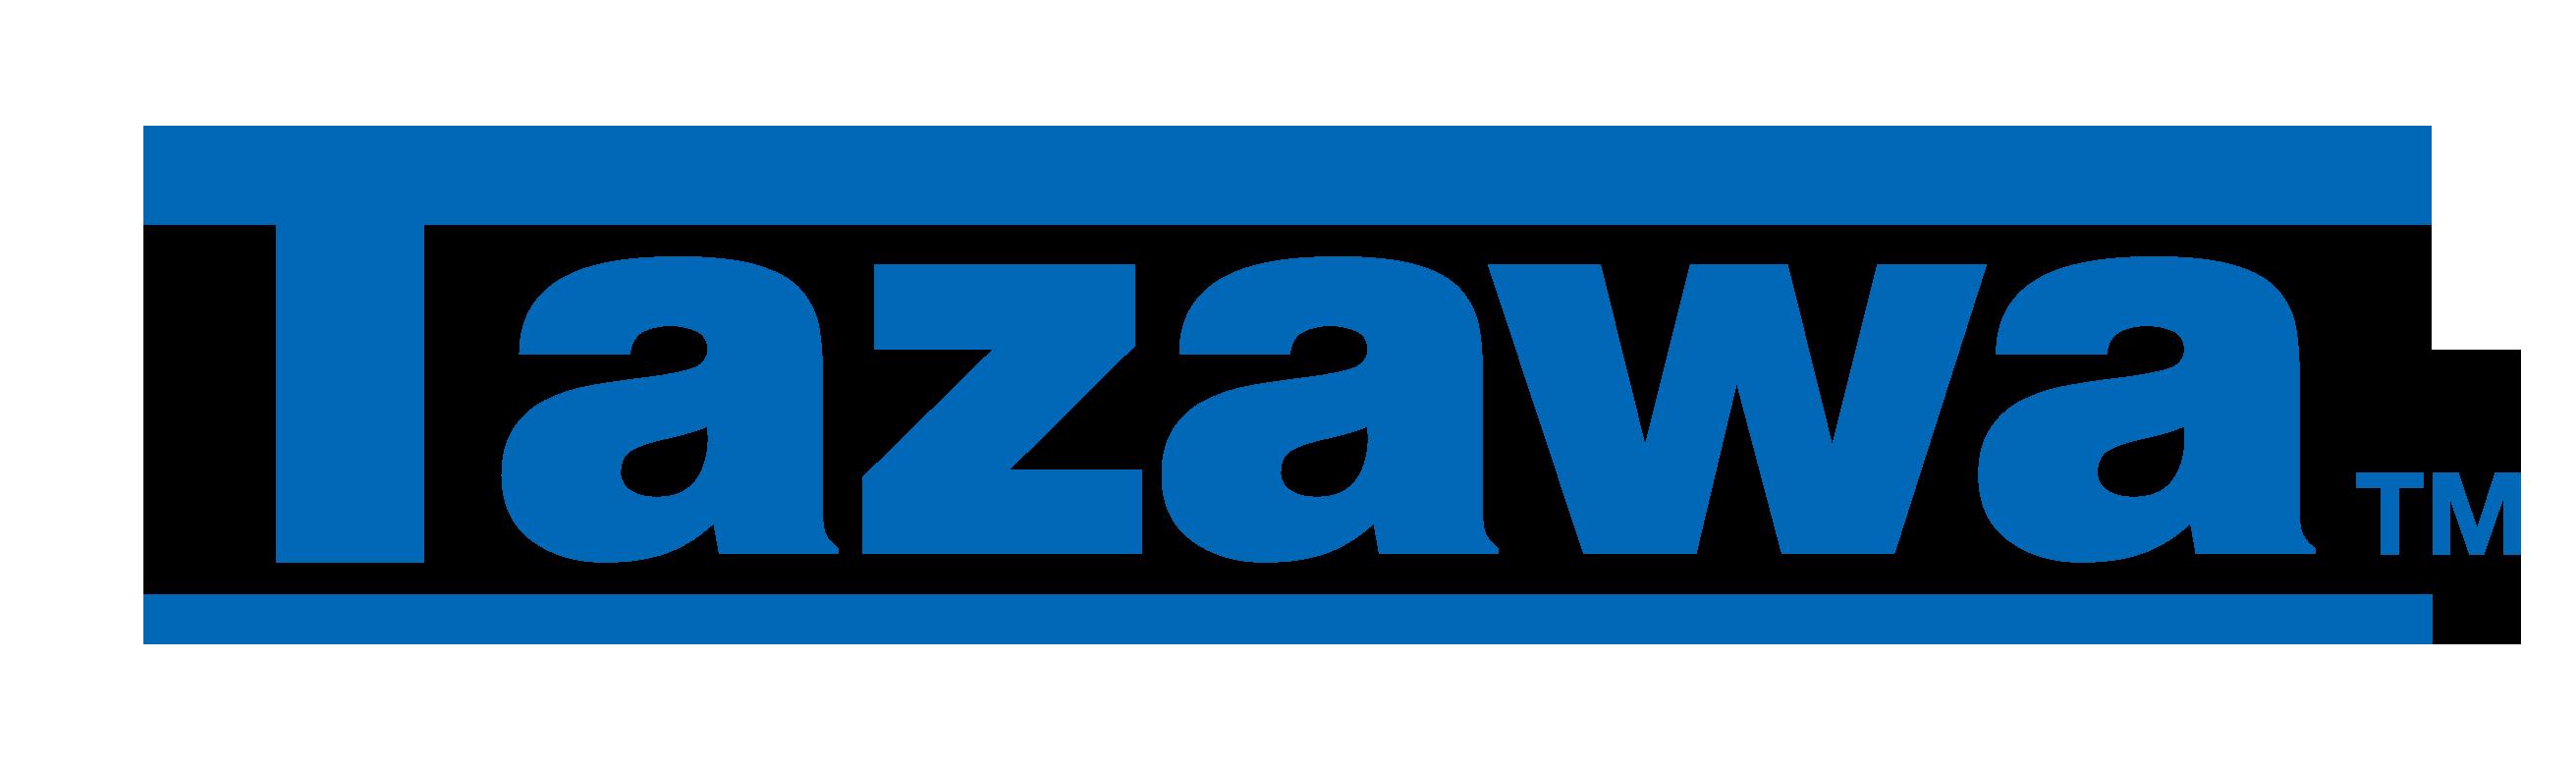 Tazawa株式会社